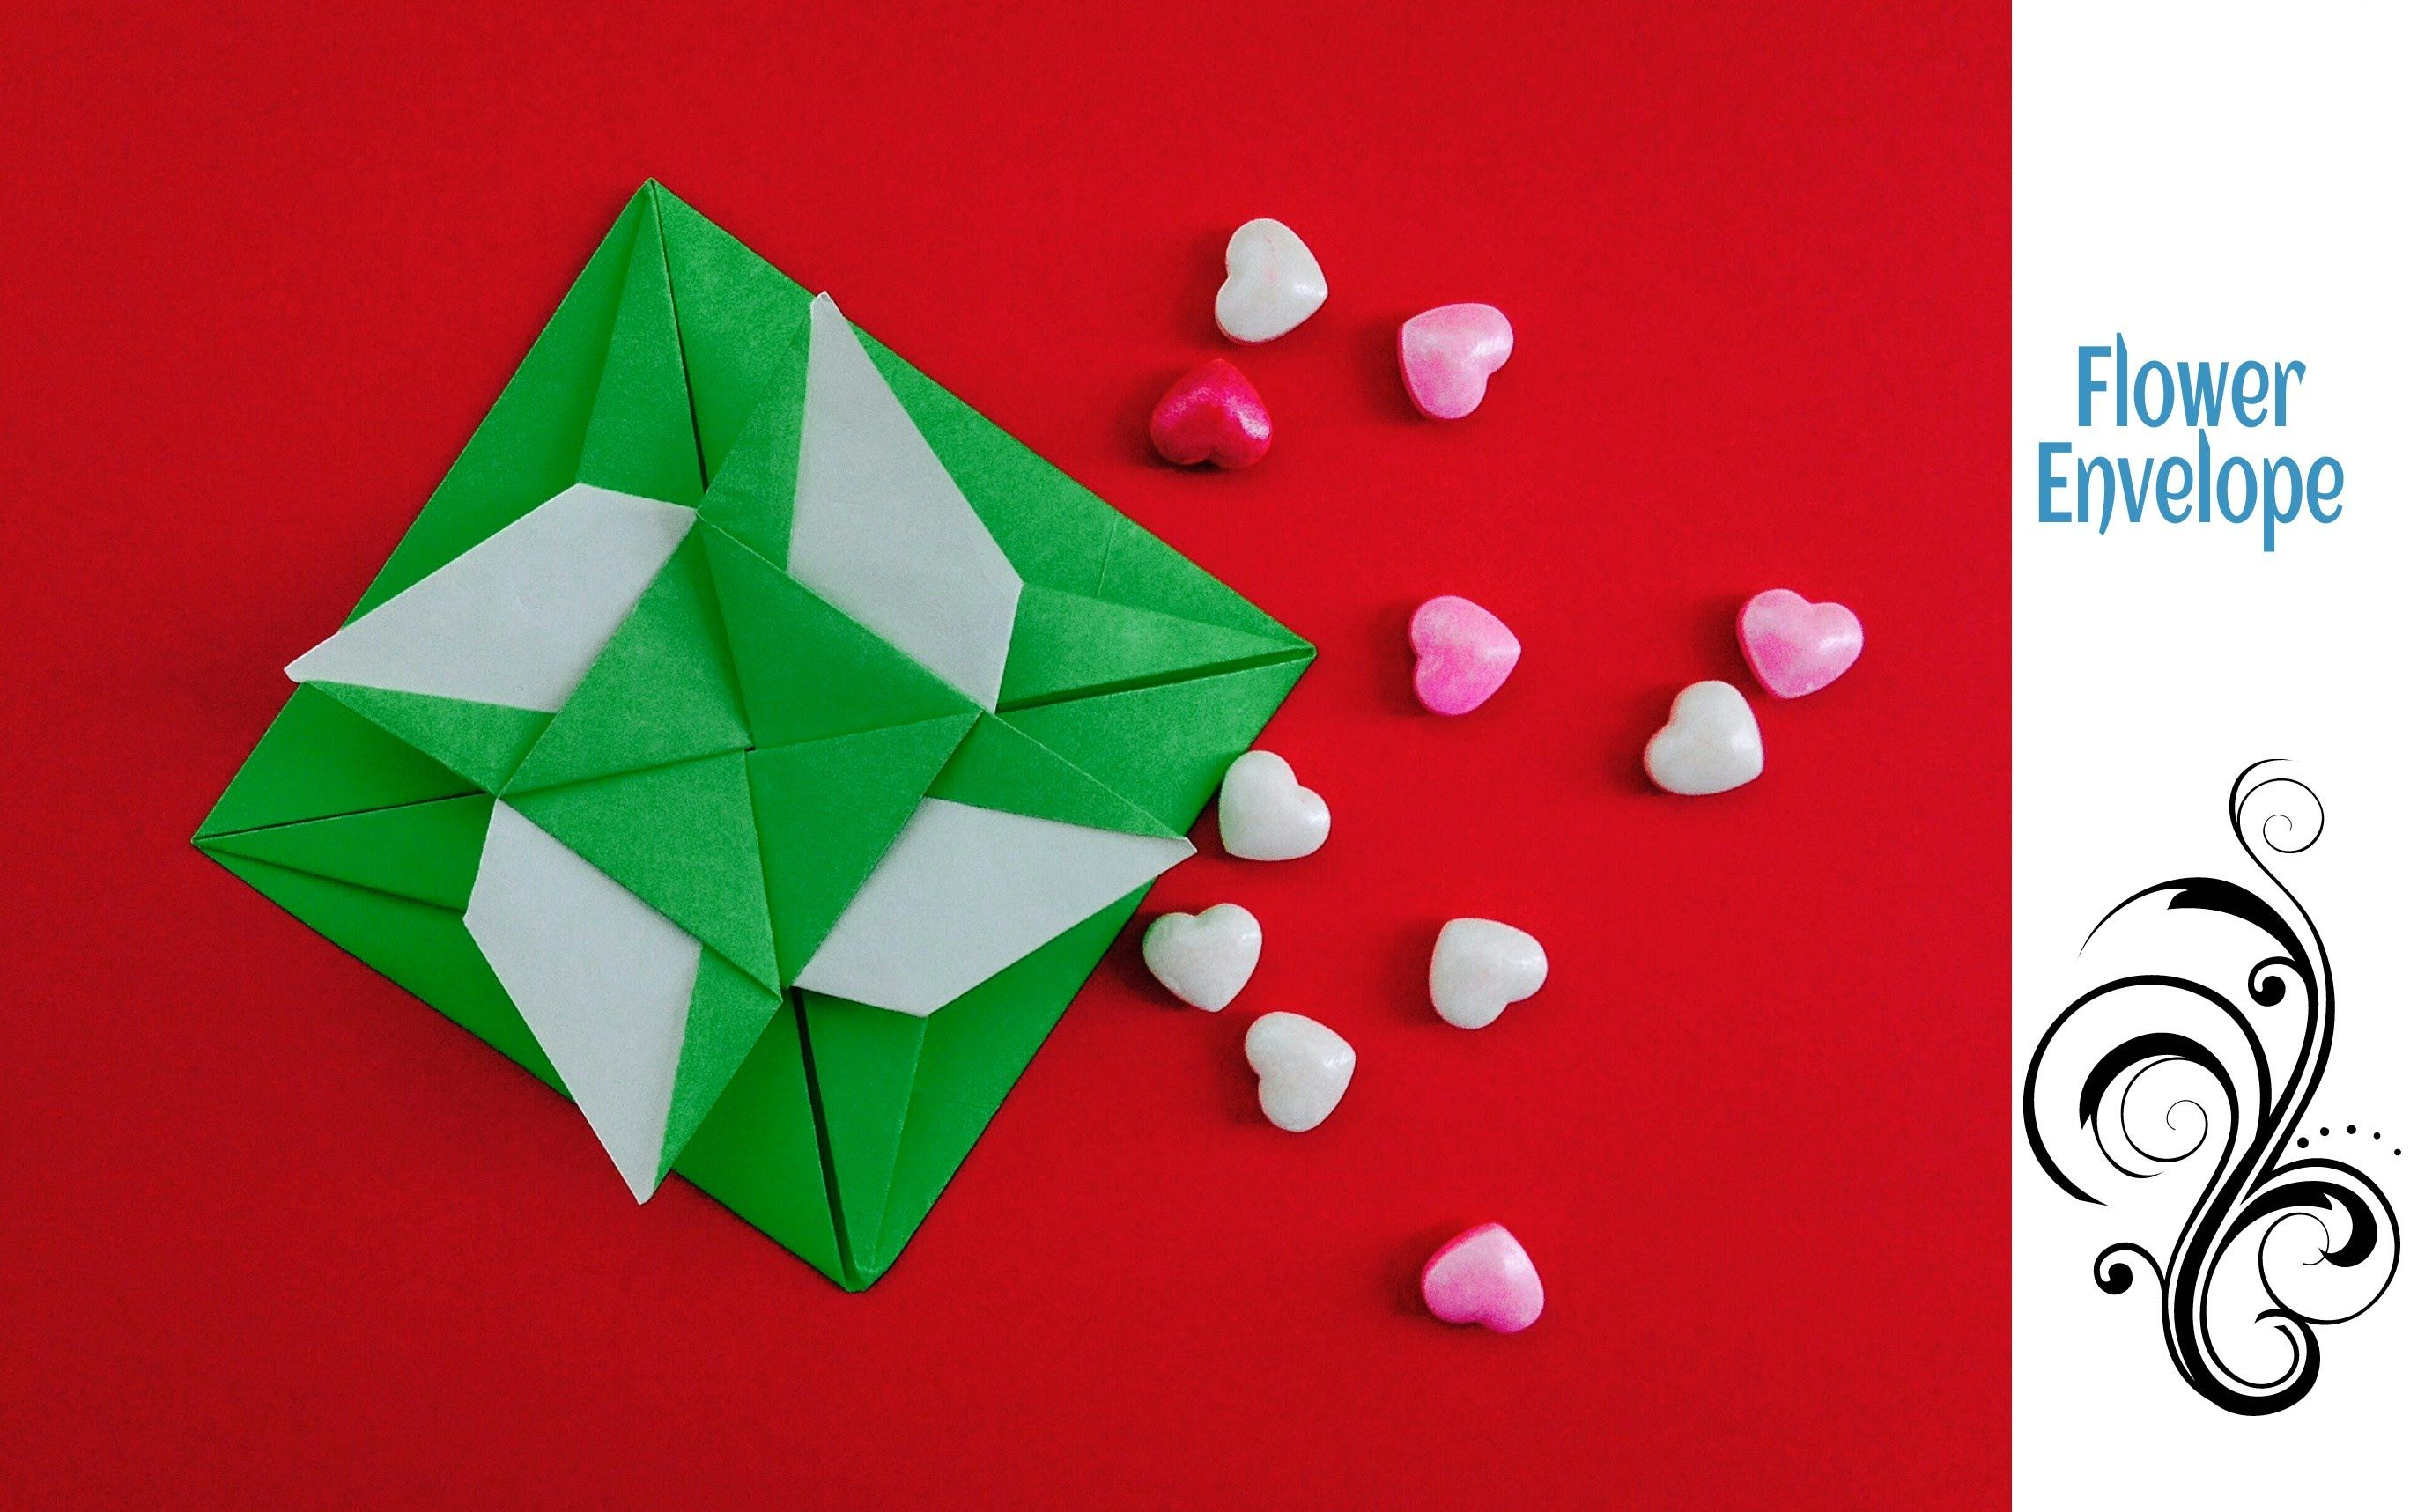 Origami Paper Flower Envelope Letter With Secret Message